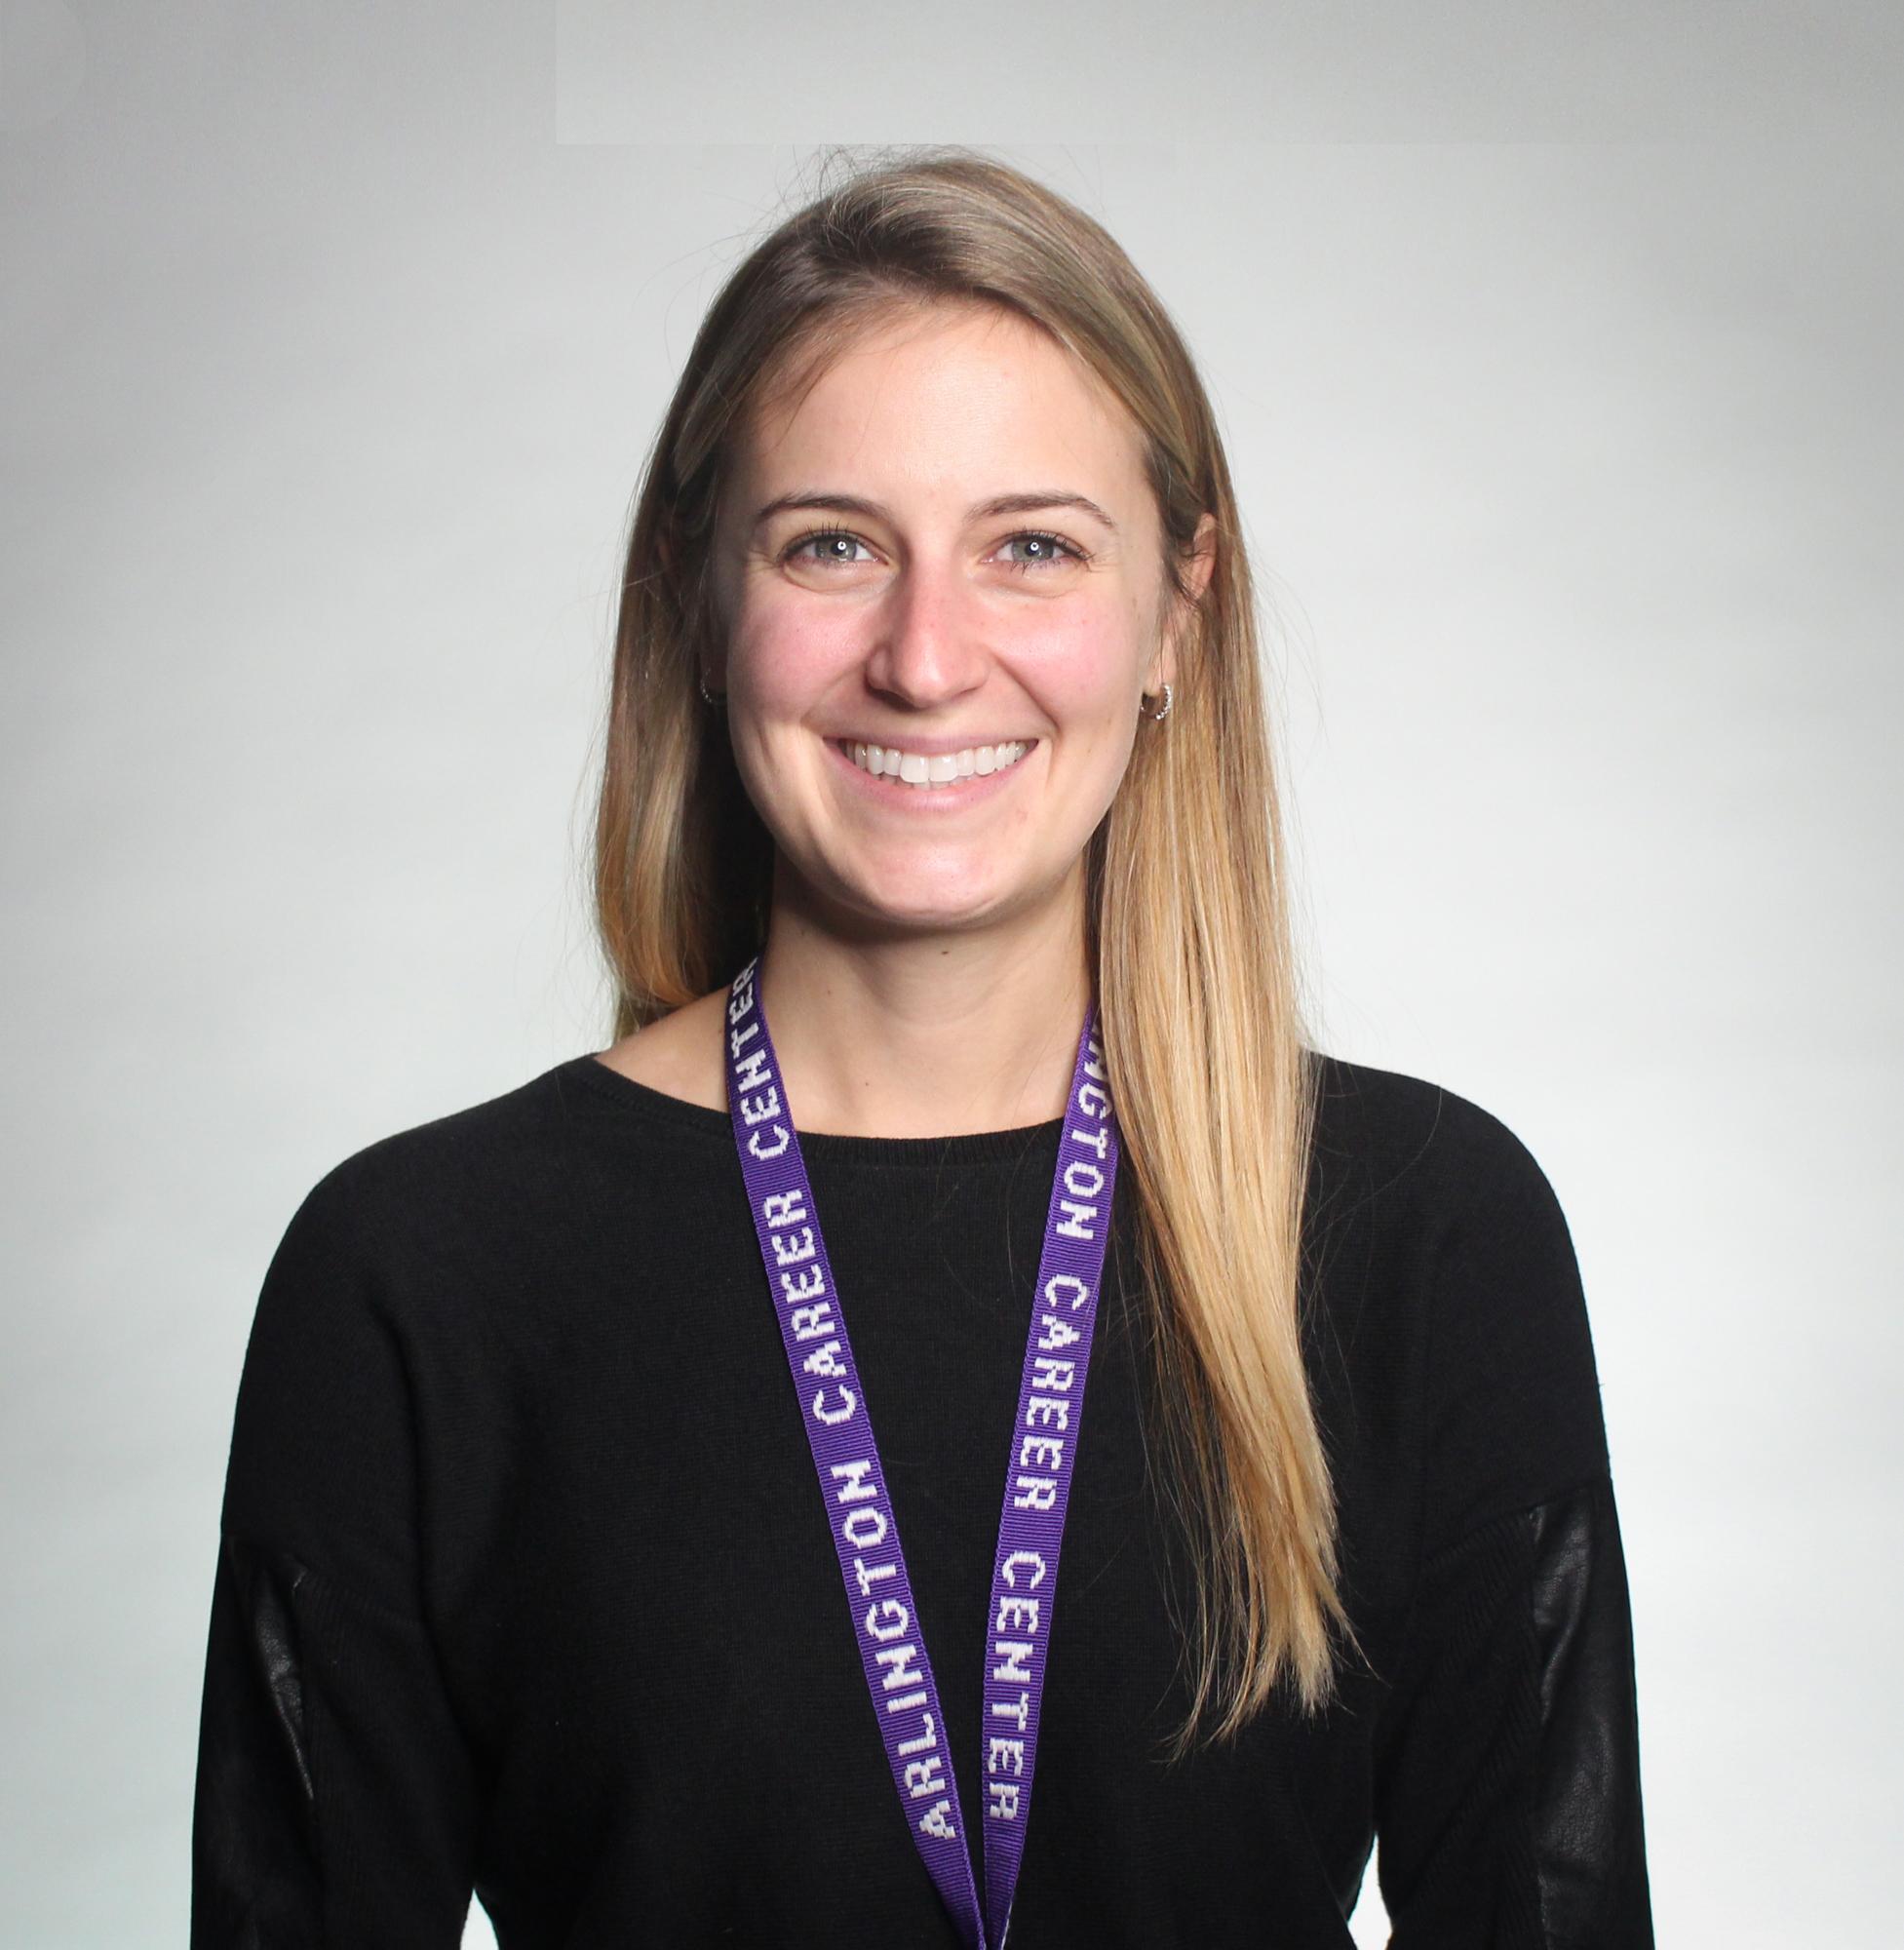 Ms. Kelly Pontera